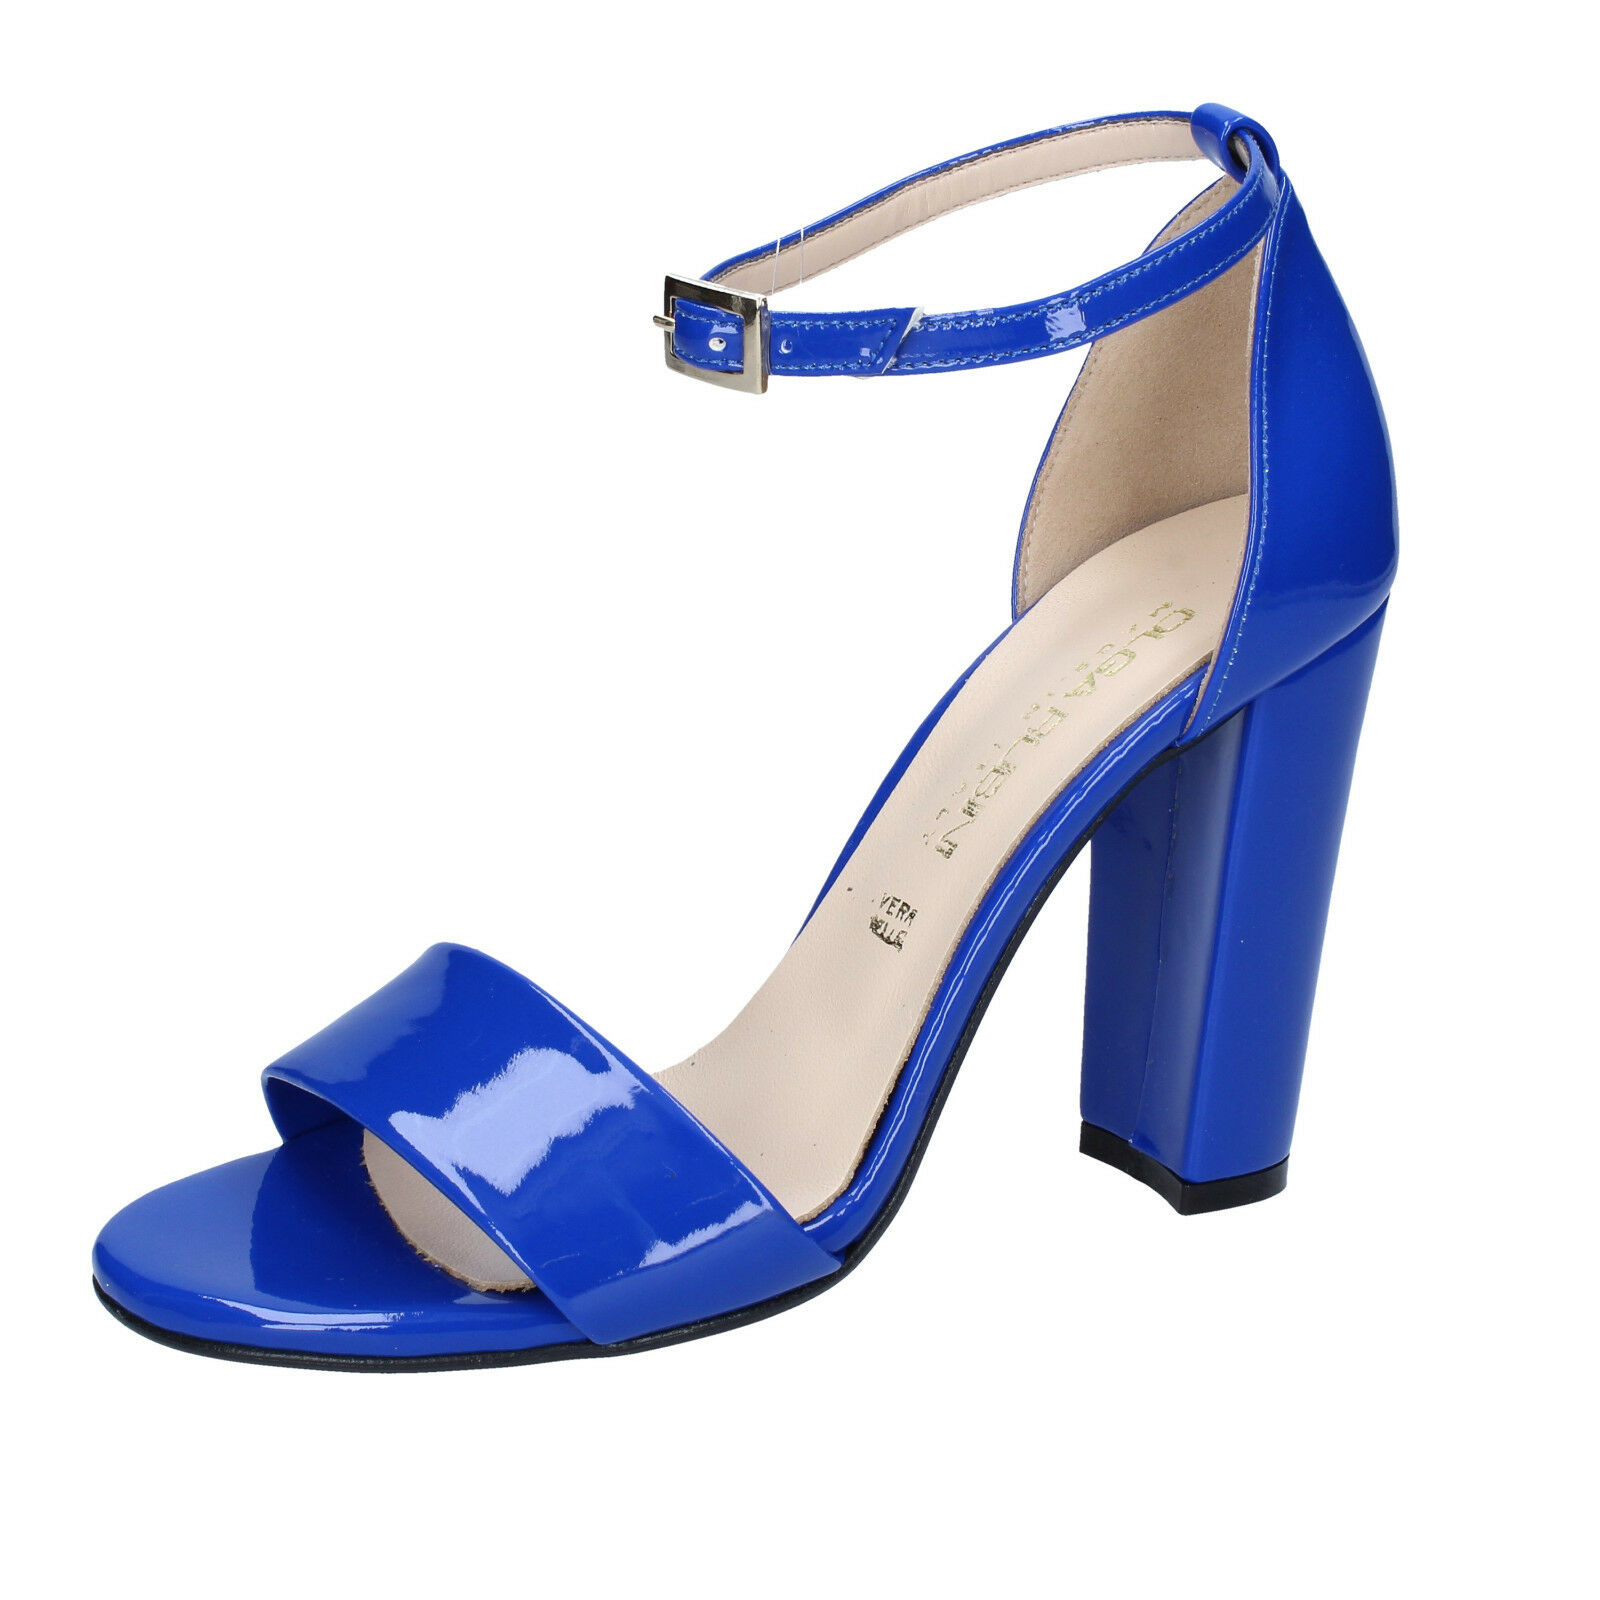 Scarpe donna OLGA RUBINI 38 EU sandali blu vernice BY298-E